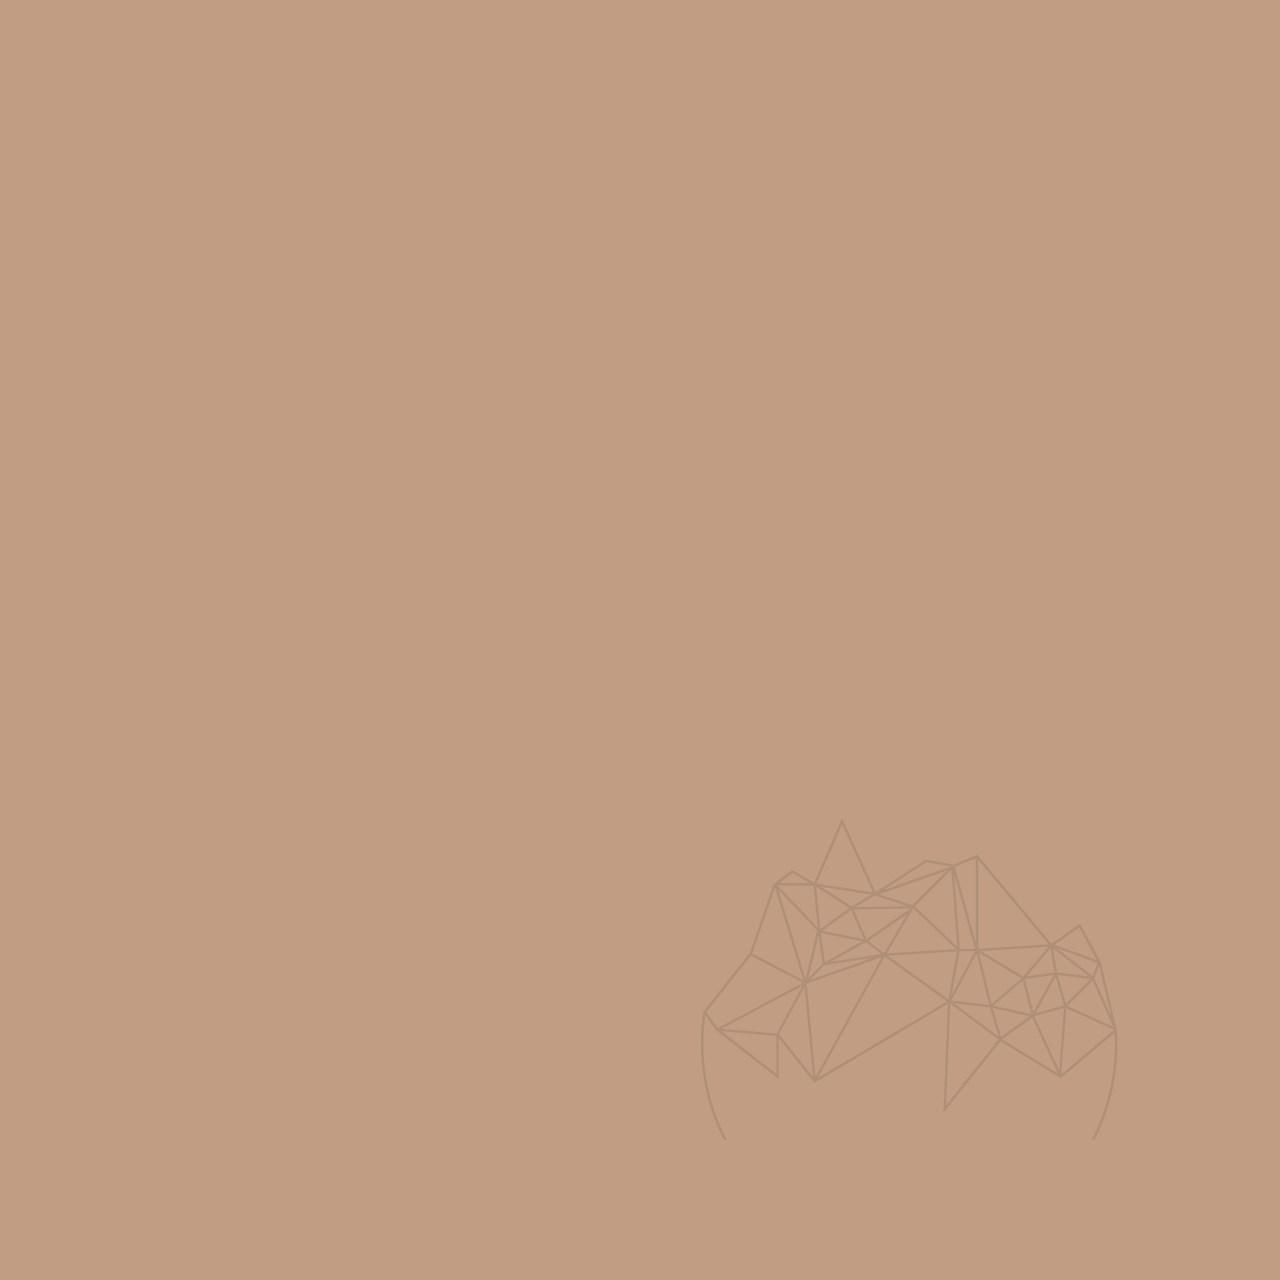 Weber Color Perfect Terracota 5 KG - Flexible wall & floor grout title=Weber Color Perfect Terracota 5 KG - Flexible wall & floor grout